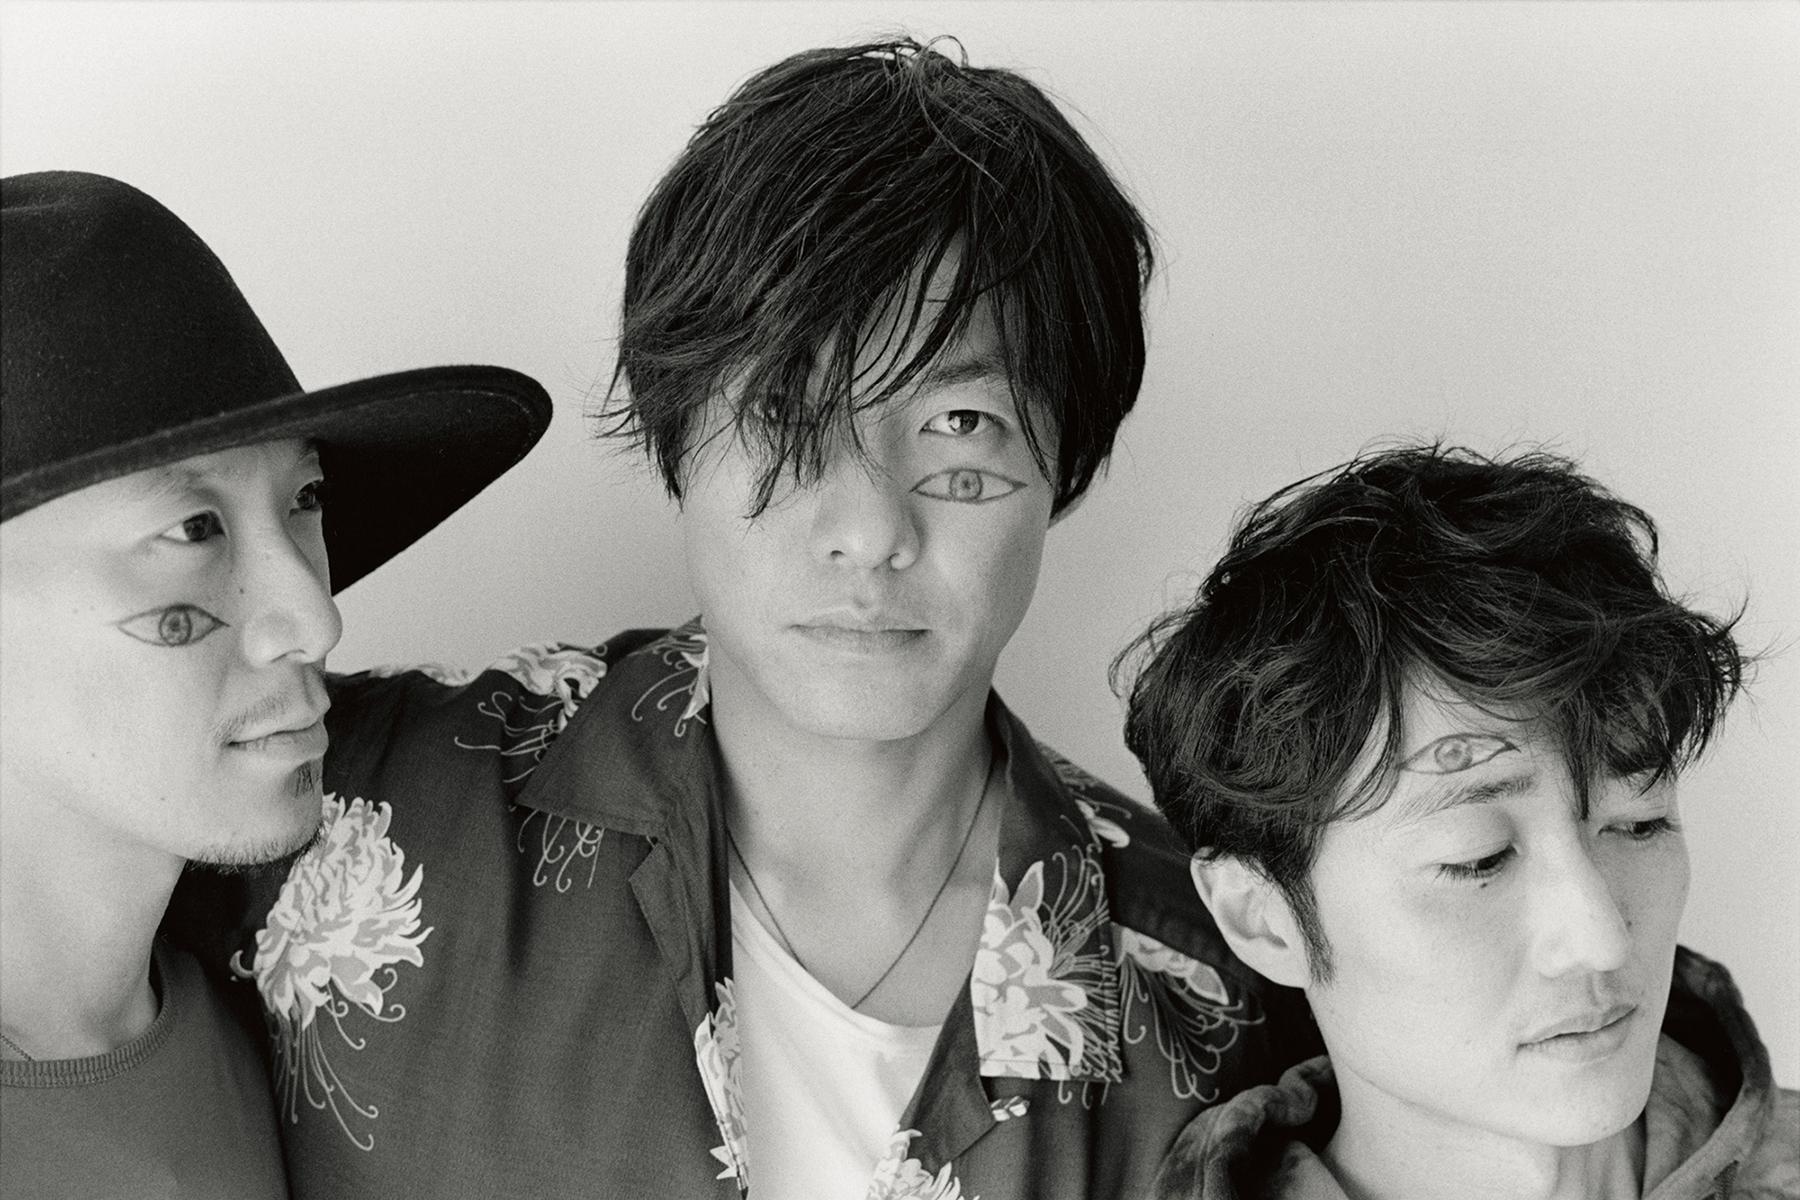 Fujifabric | Sony Music Artists